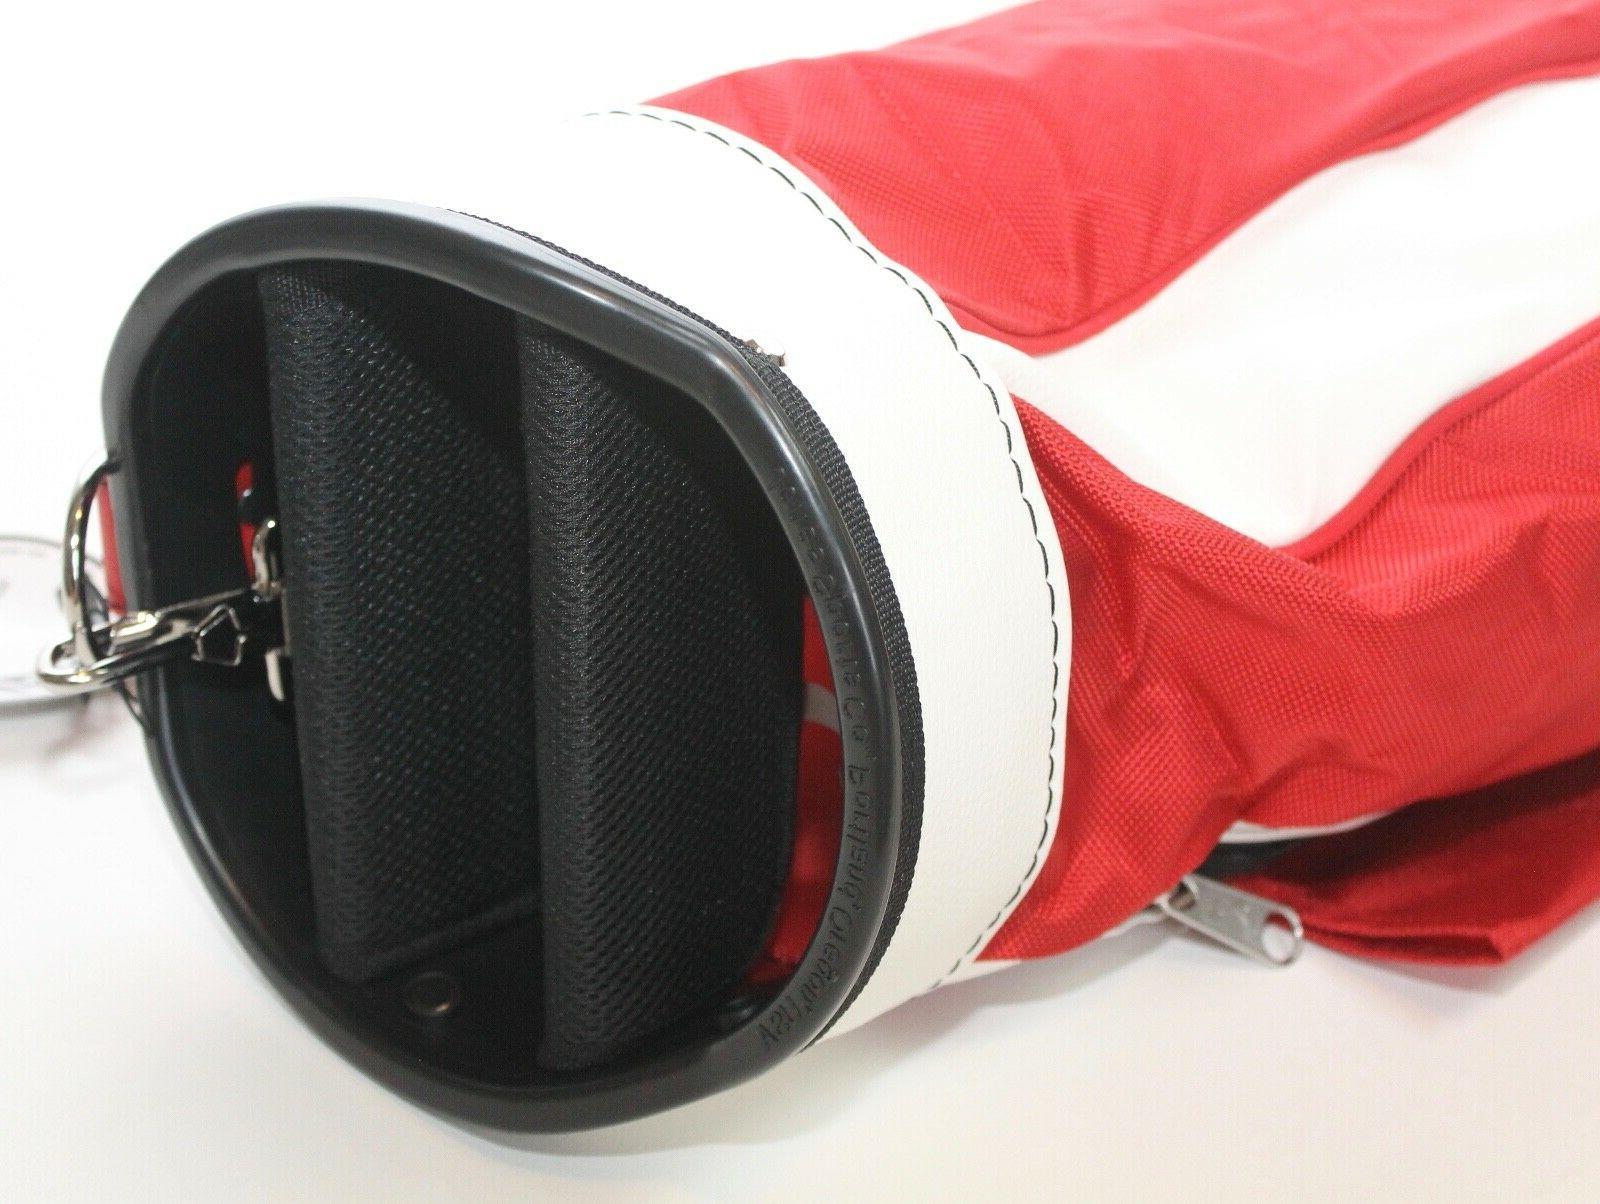 Original Jones Golf Single Strap Carry Bag & White Lightweight New